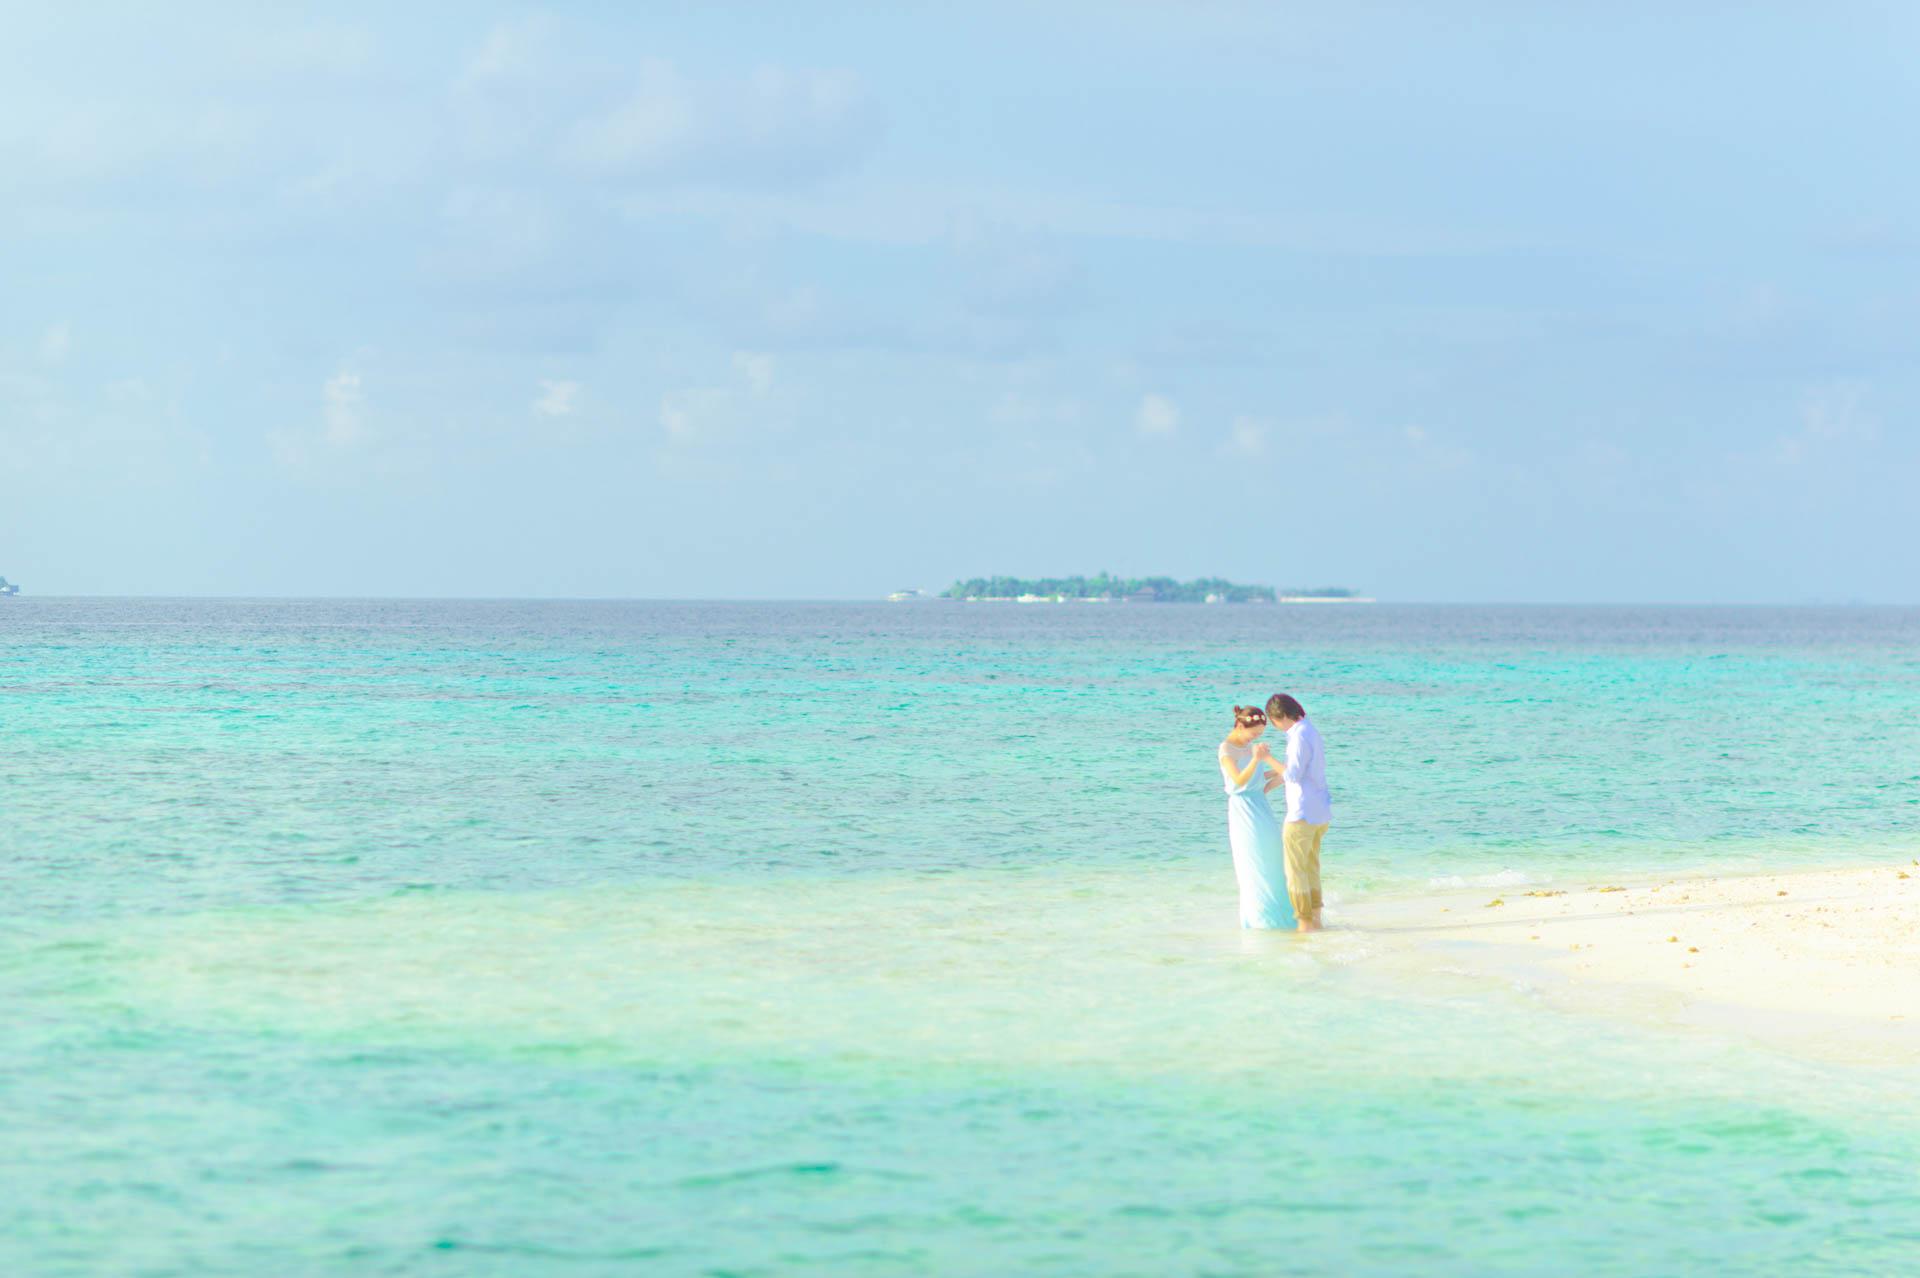 Devin and Natsuko Honeymoon at Makunudhoo Island Maldives 13